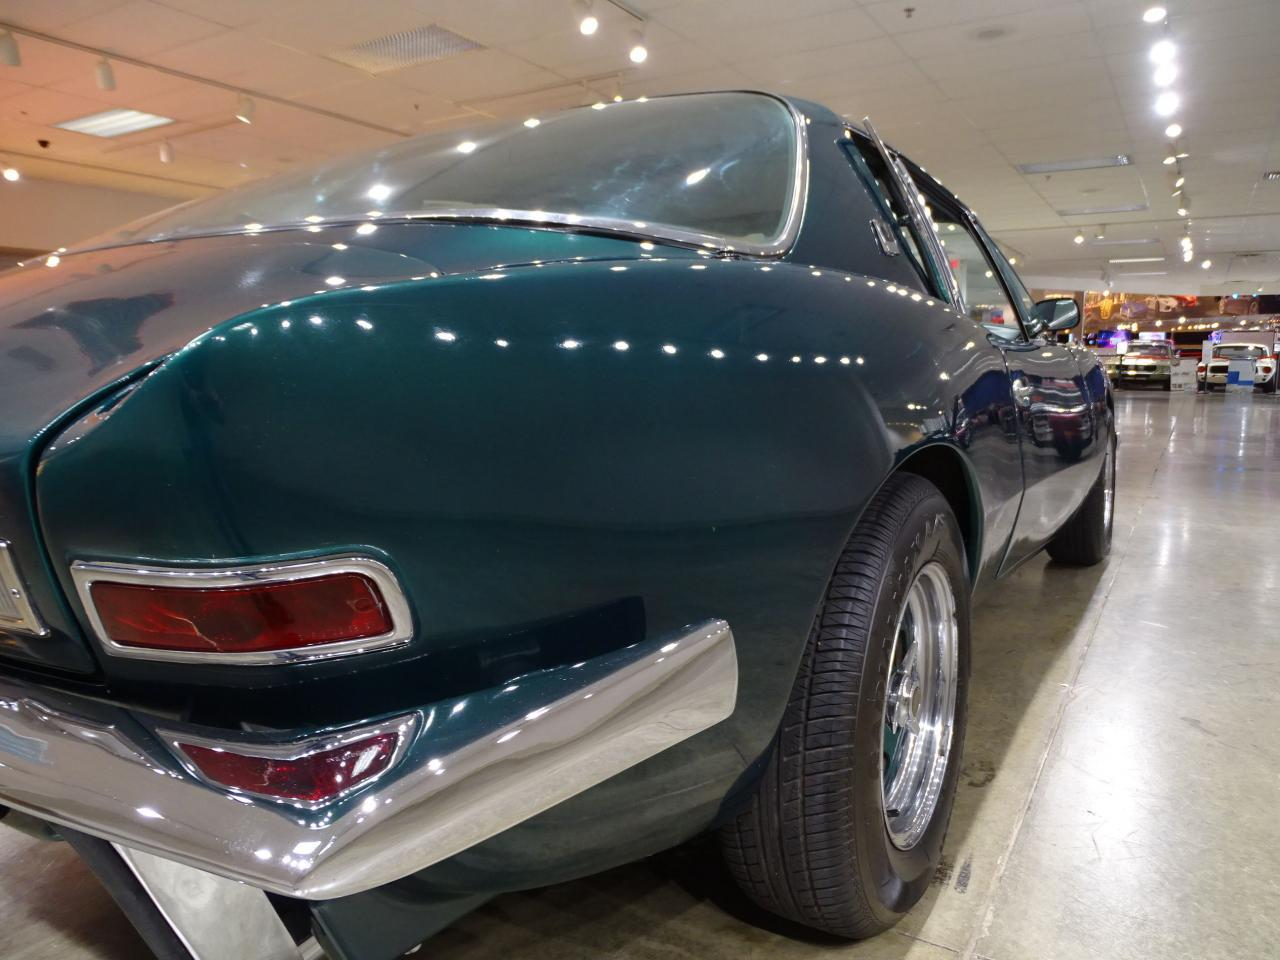 1963 Studebaker Avanti (CC-1227482) for sale in O'Fallon, Illinois